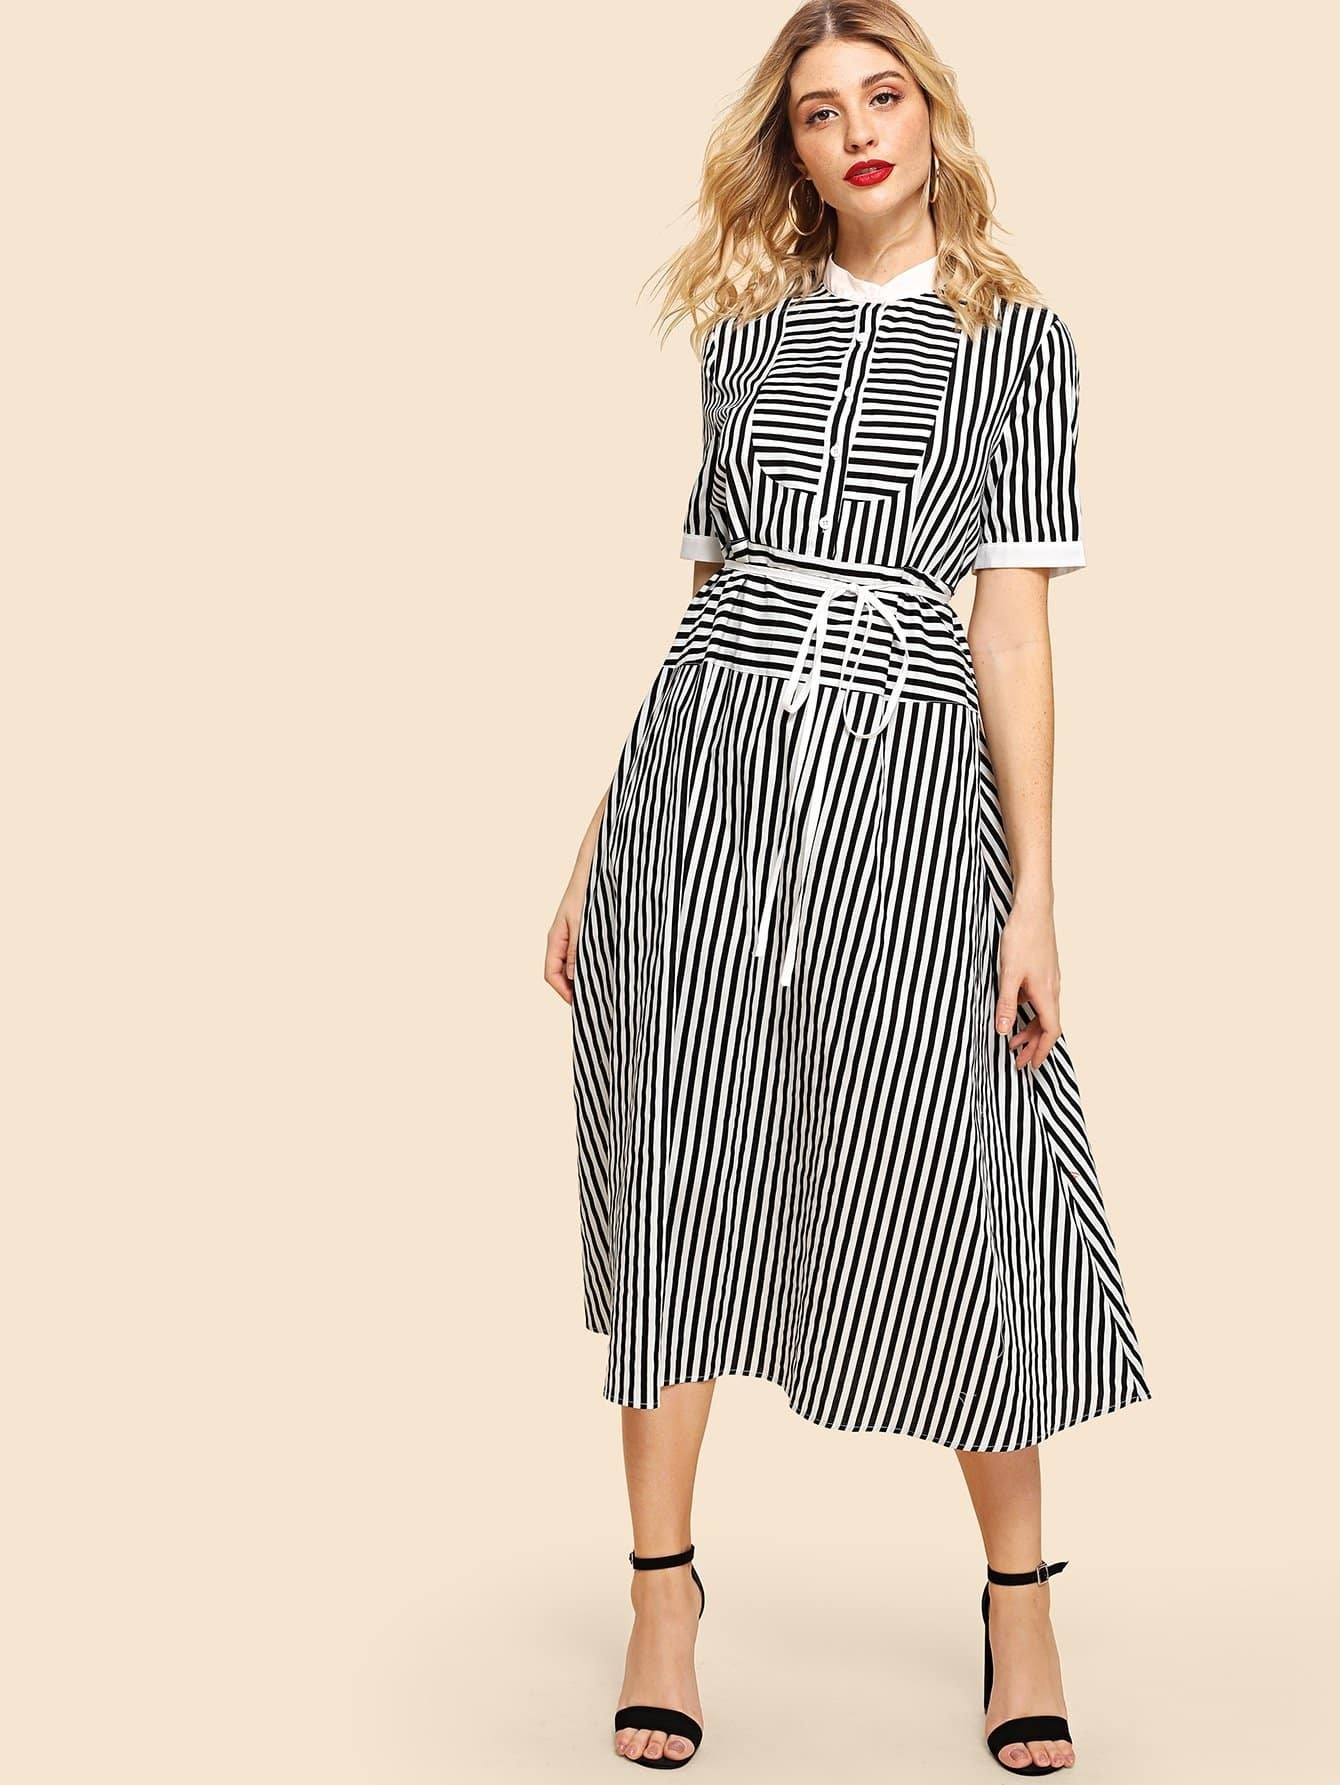 Mock Neck Button Front Tie Waist Striped Dress tie neck elastic waist glitter dress